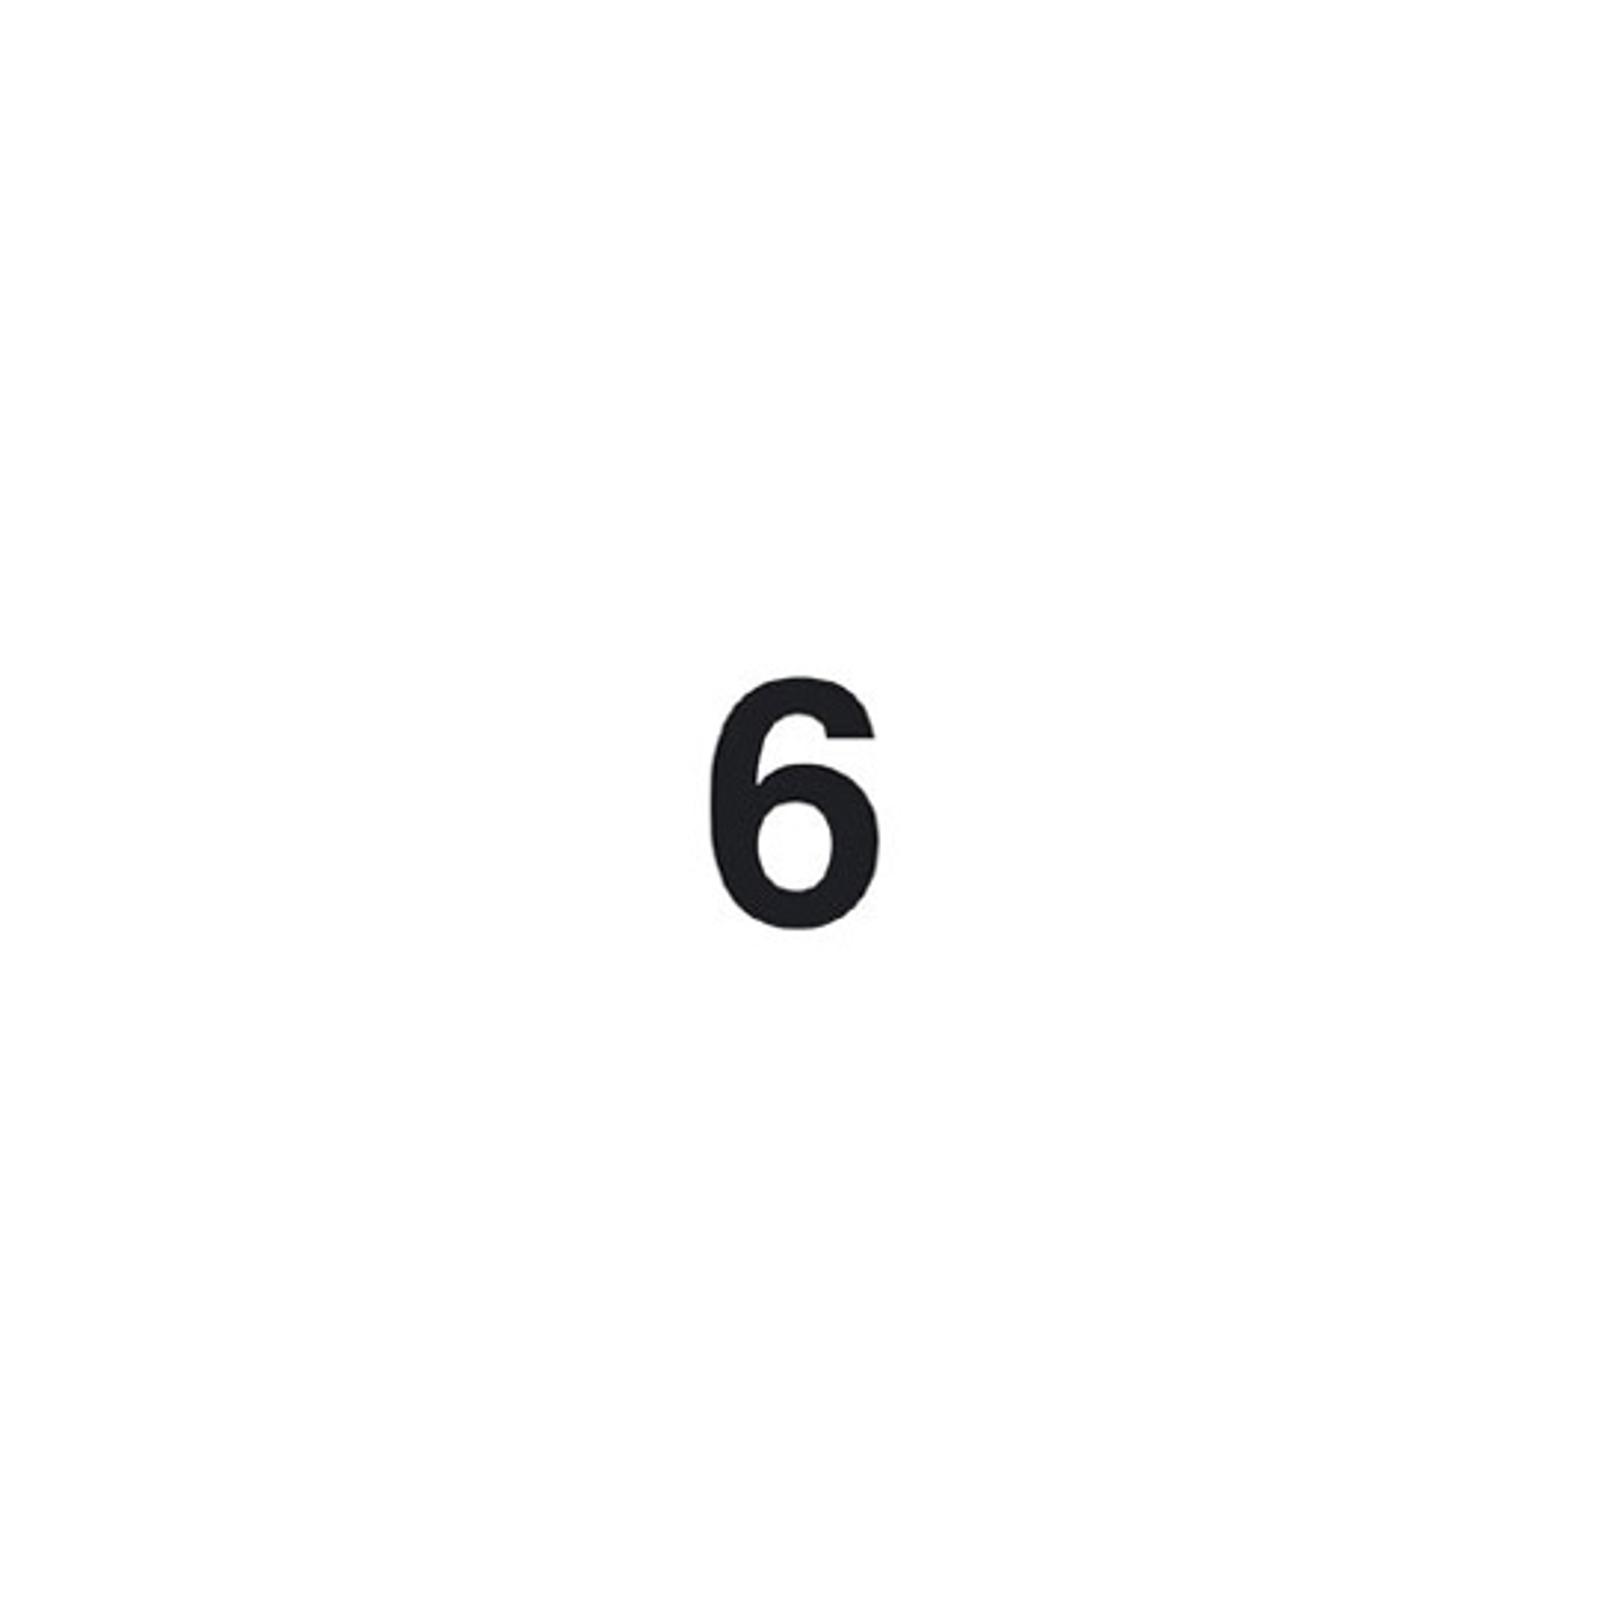 Selbstklebende Ziffer 6